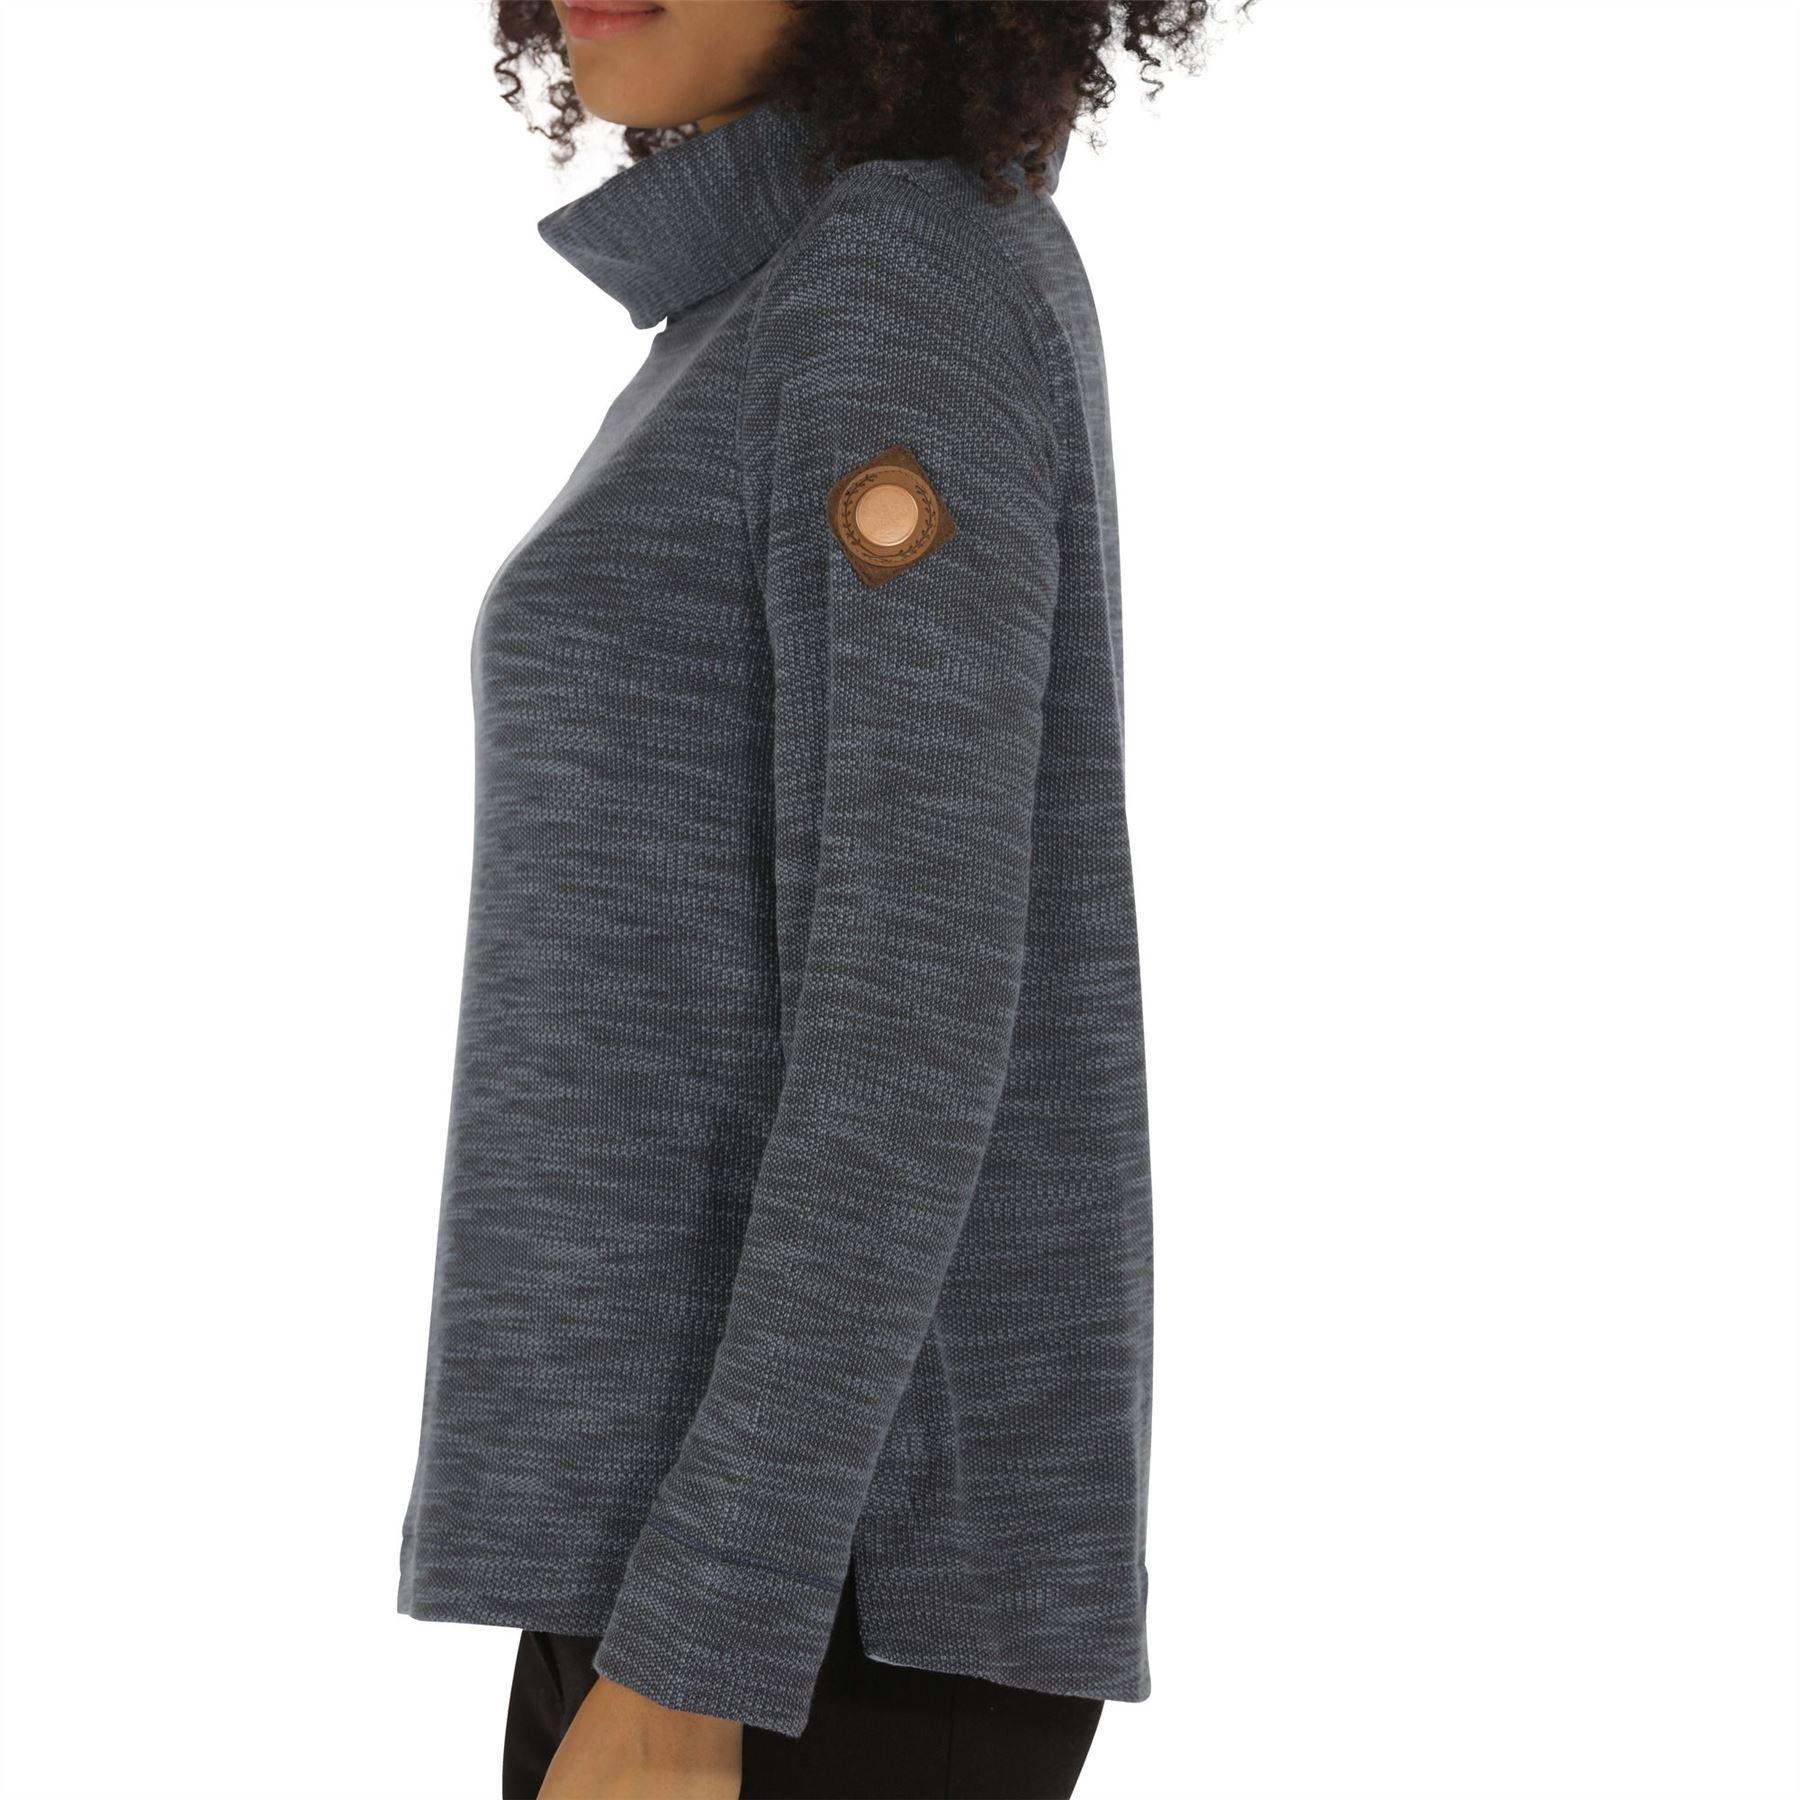 Regatta-Ceanna-Cowl-Neck-Soft-Fleece-Pull-Over-Jumper-Sweater-Top-RWA276 thumbnail 5